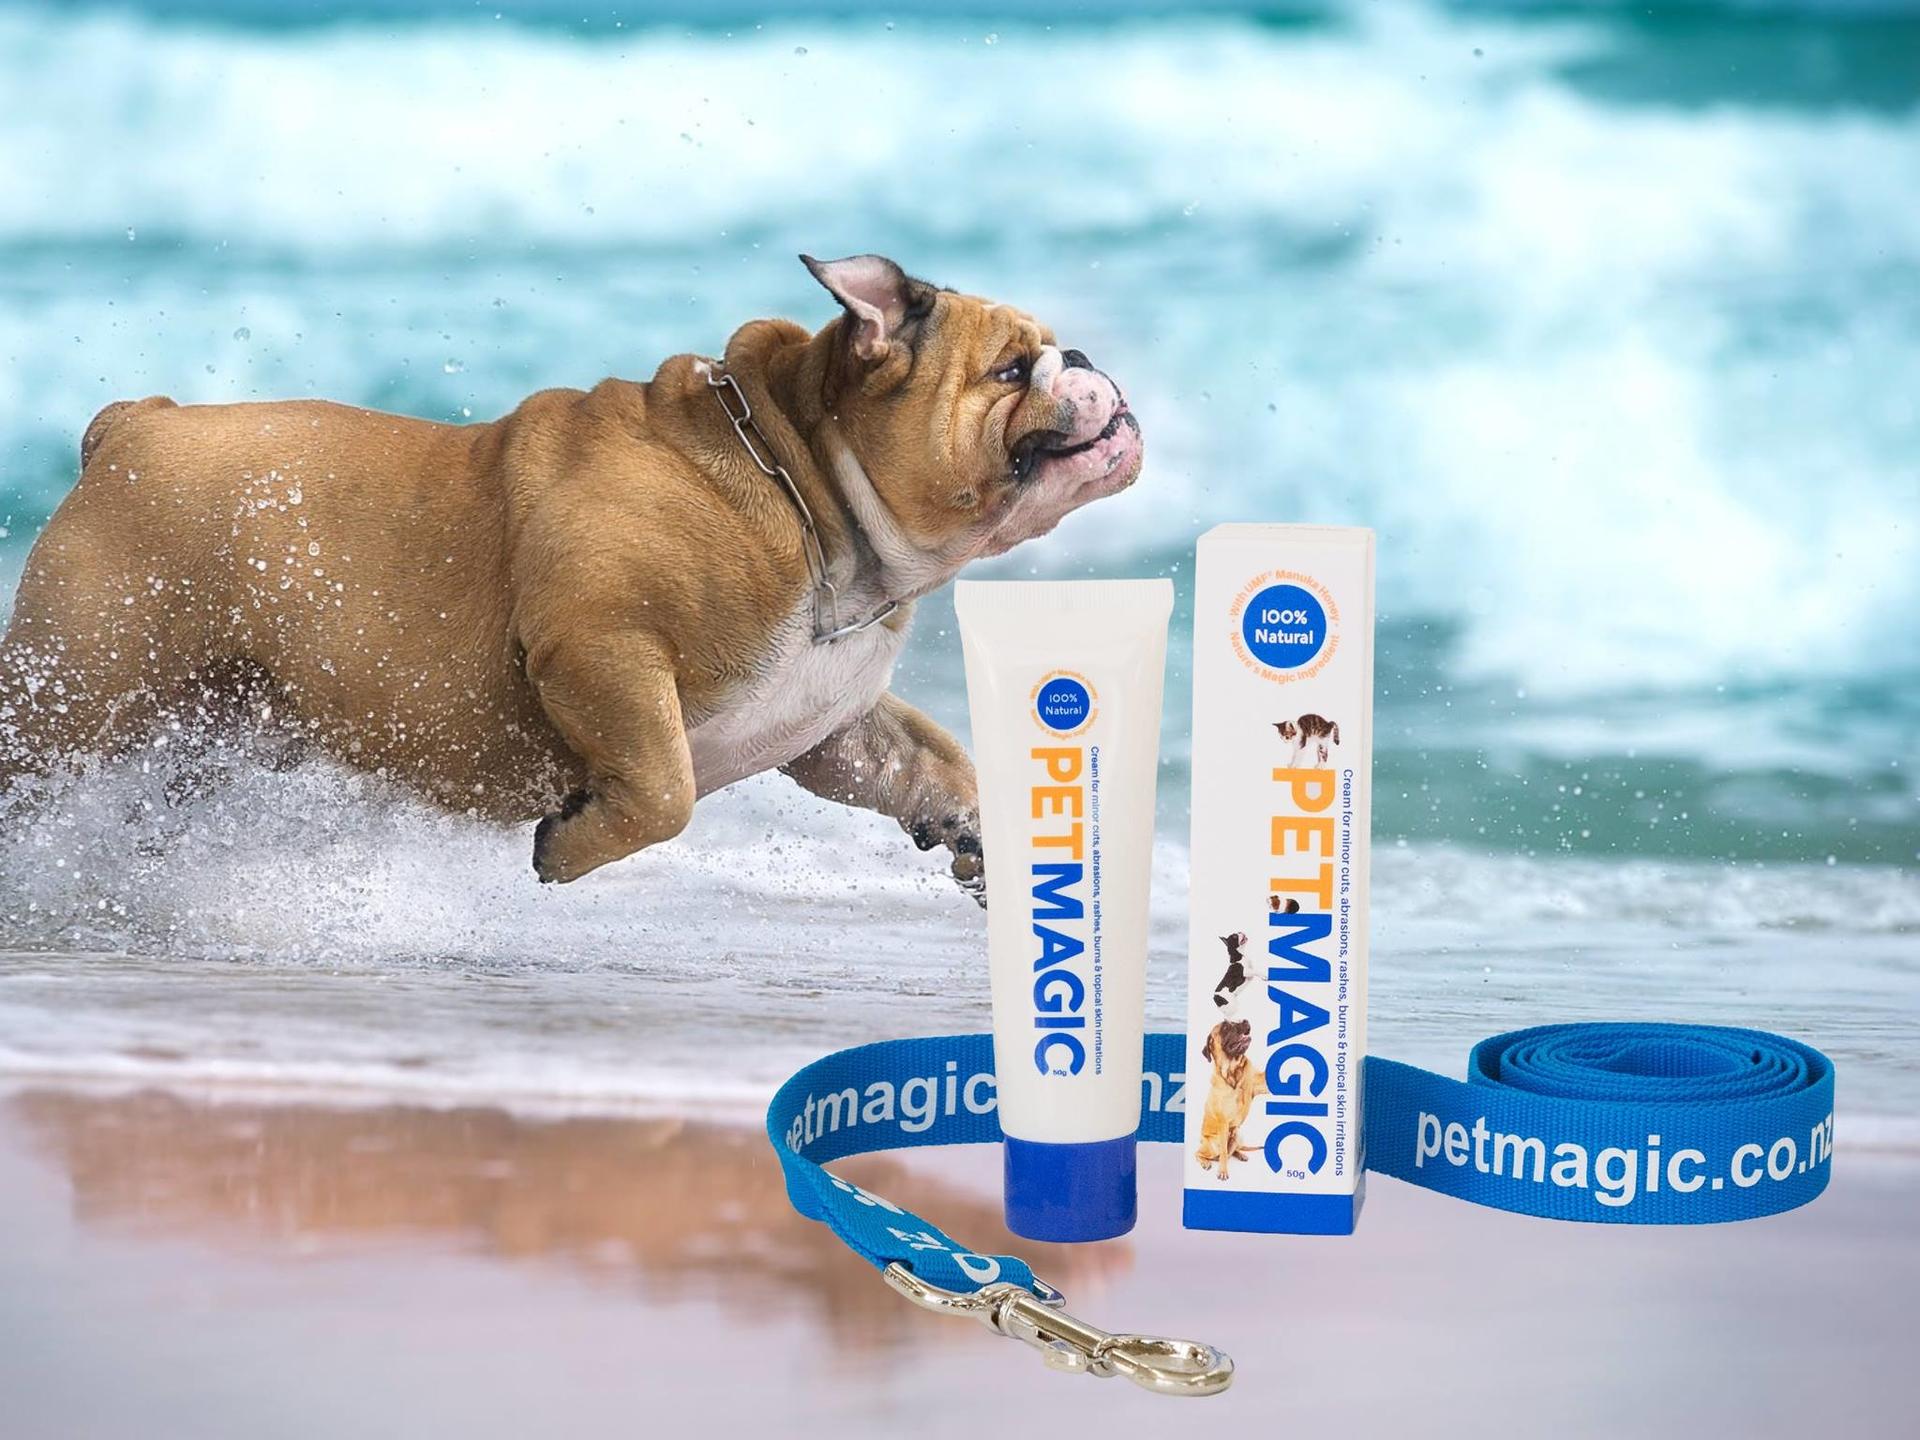 Wondverzorging bij hond met Pet Magic Manuka honing wondzalf